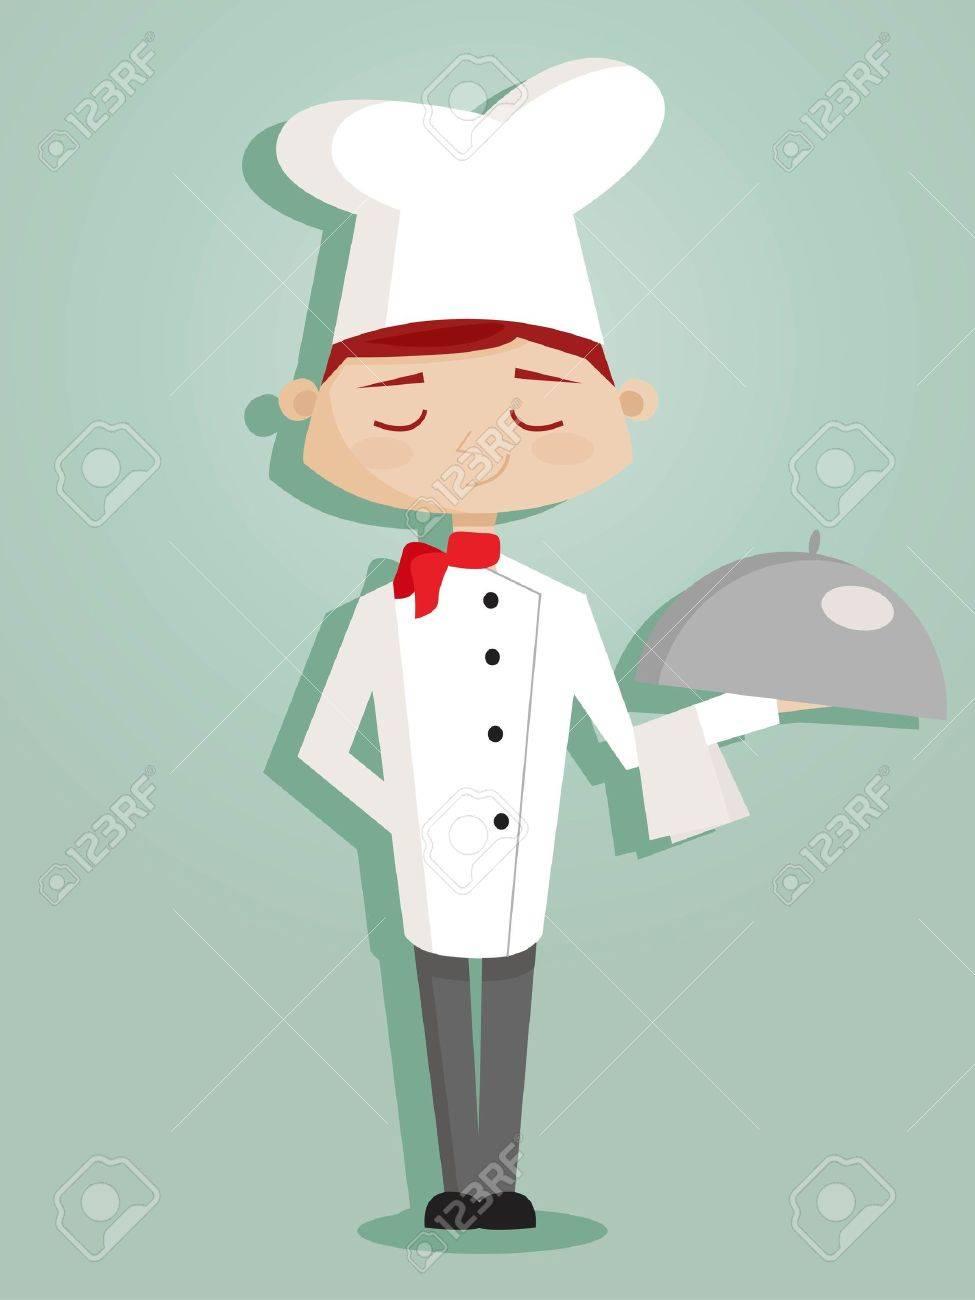 Retro cartoon chef Stock Vector - 9445425